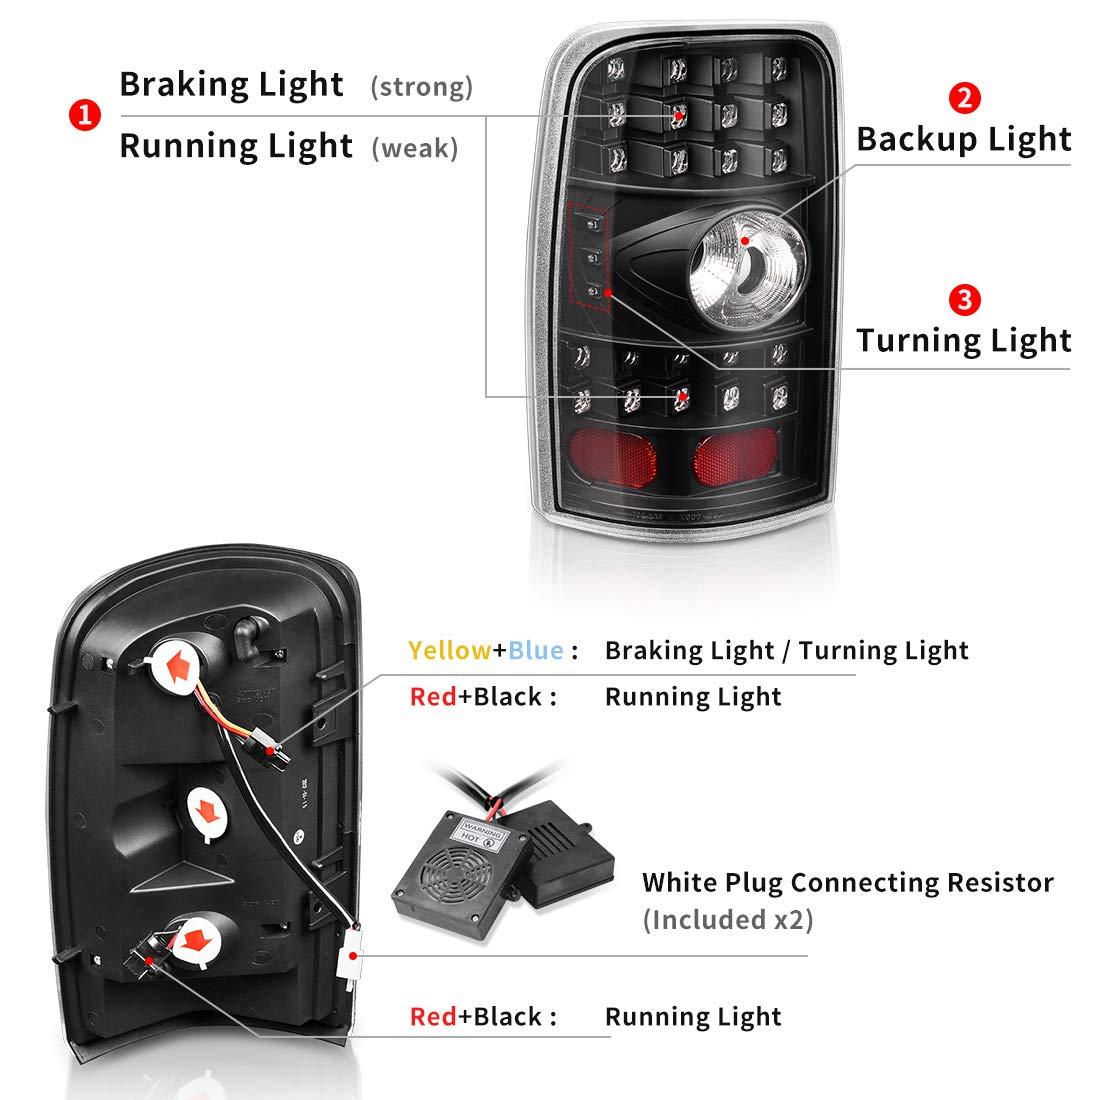 -Black 100W Halogen Larson Electronics 1015P9INNHY 6 inch 1998 Union City Body P-12 High Corner mount spotlight Driver side WITH install kit